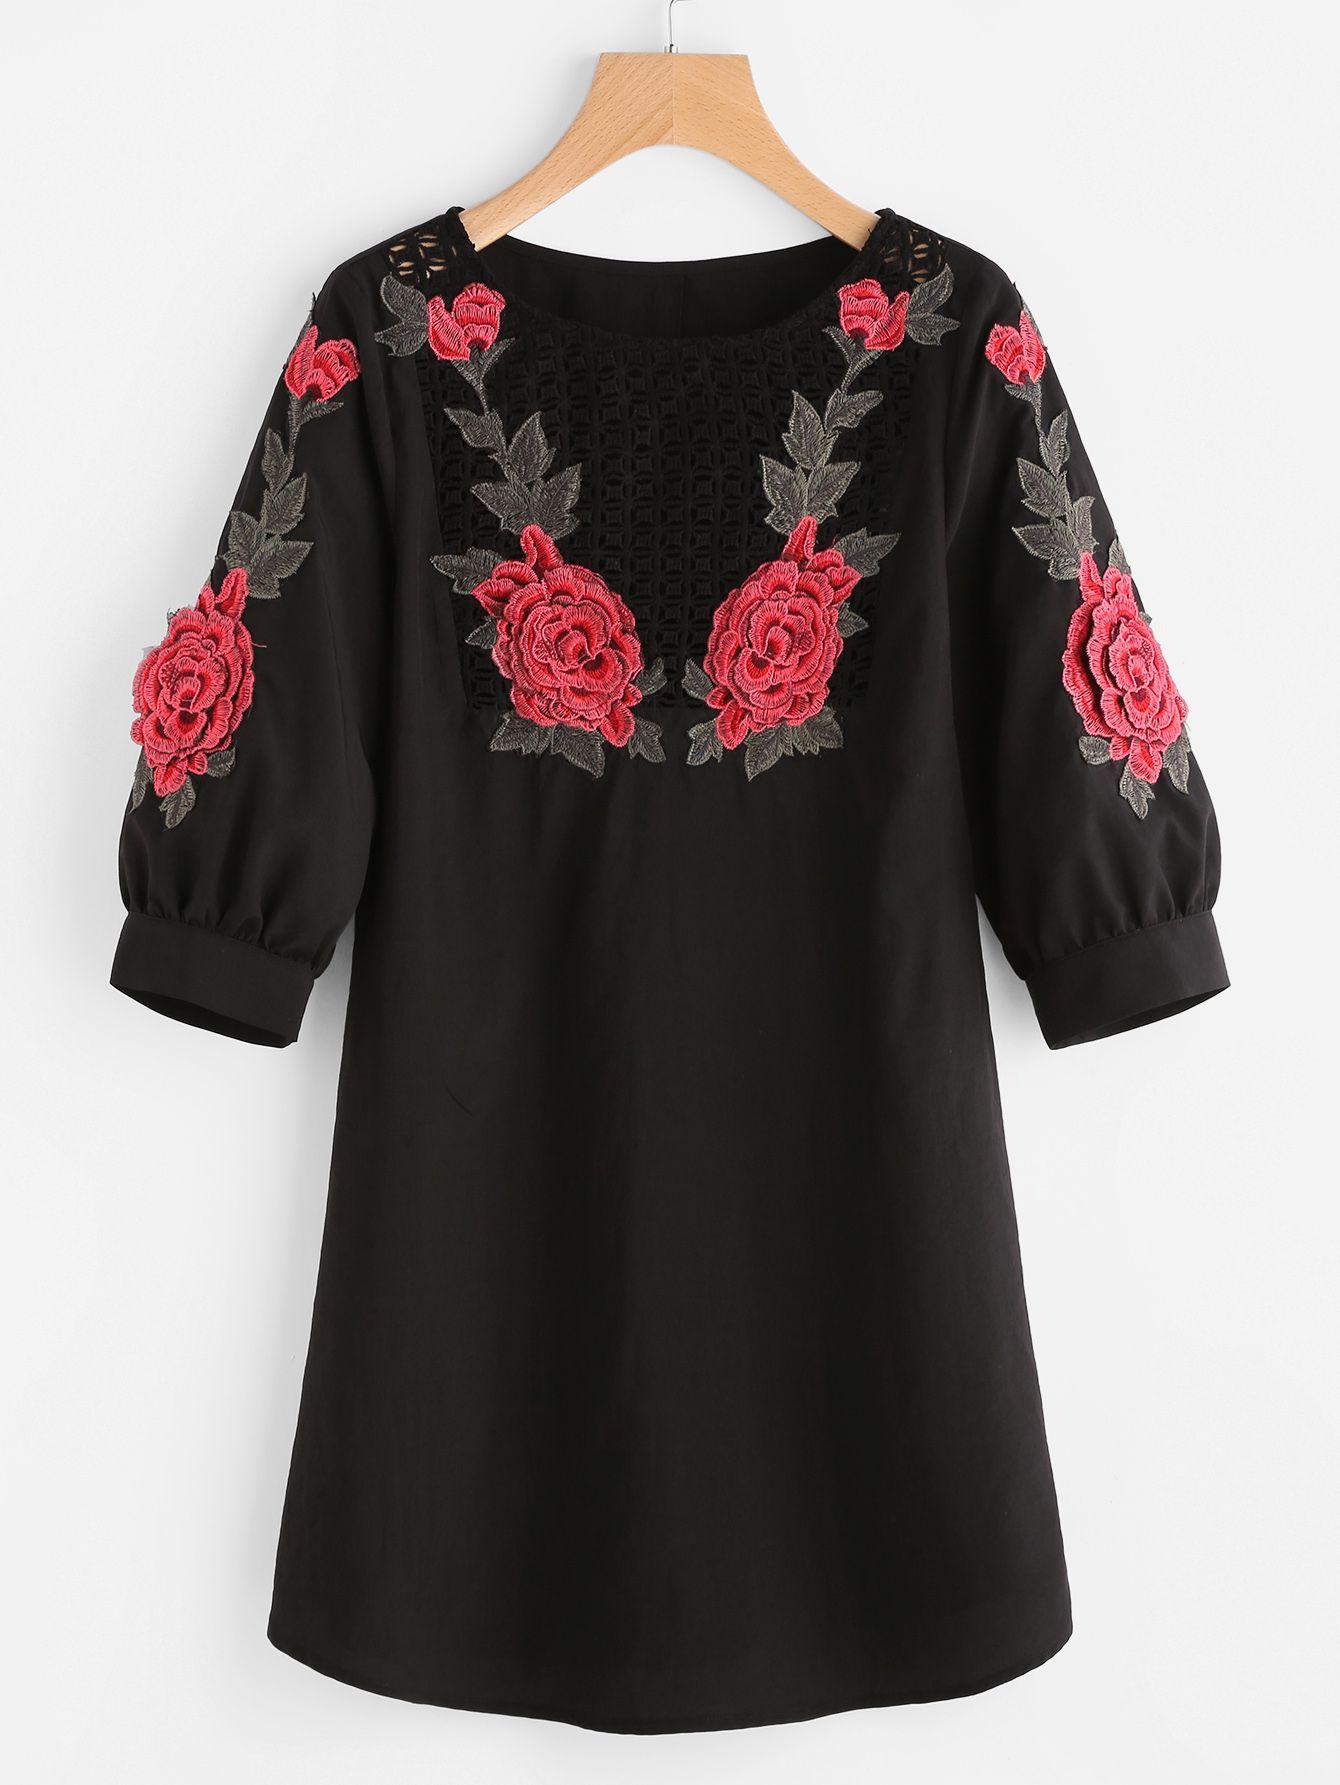 97c724ace6313 Shop Crochet Yoke 3D Rose Applique Puff Sleeve Dress online. SheIn ...